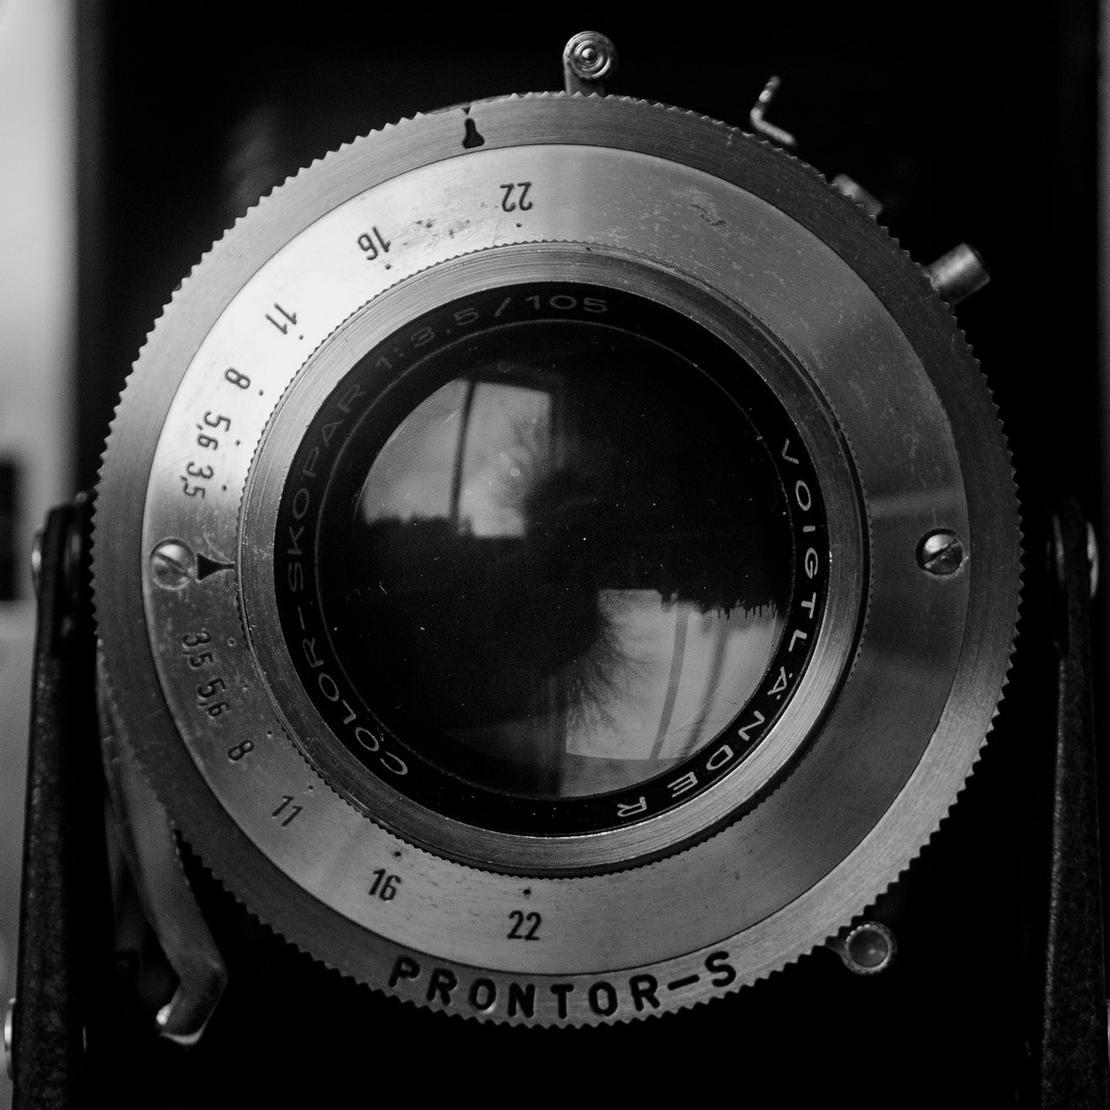 A very close, closeup photo of Color-Skopar 105mm f3.5.